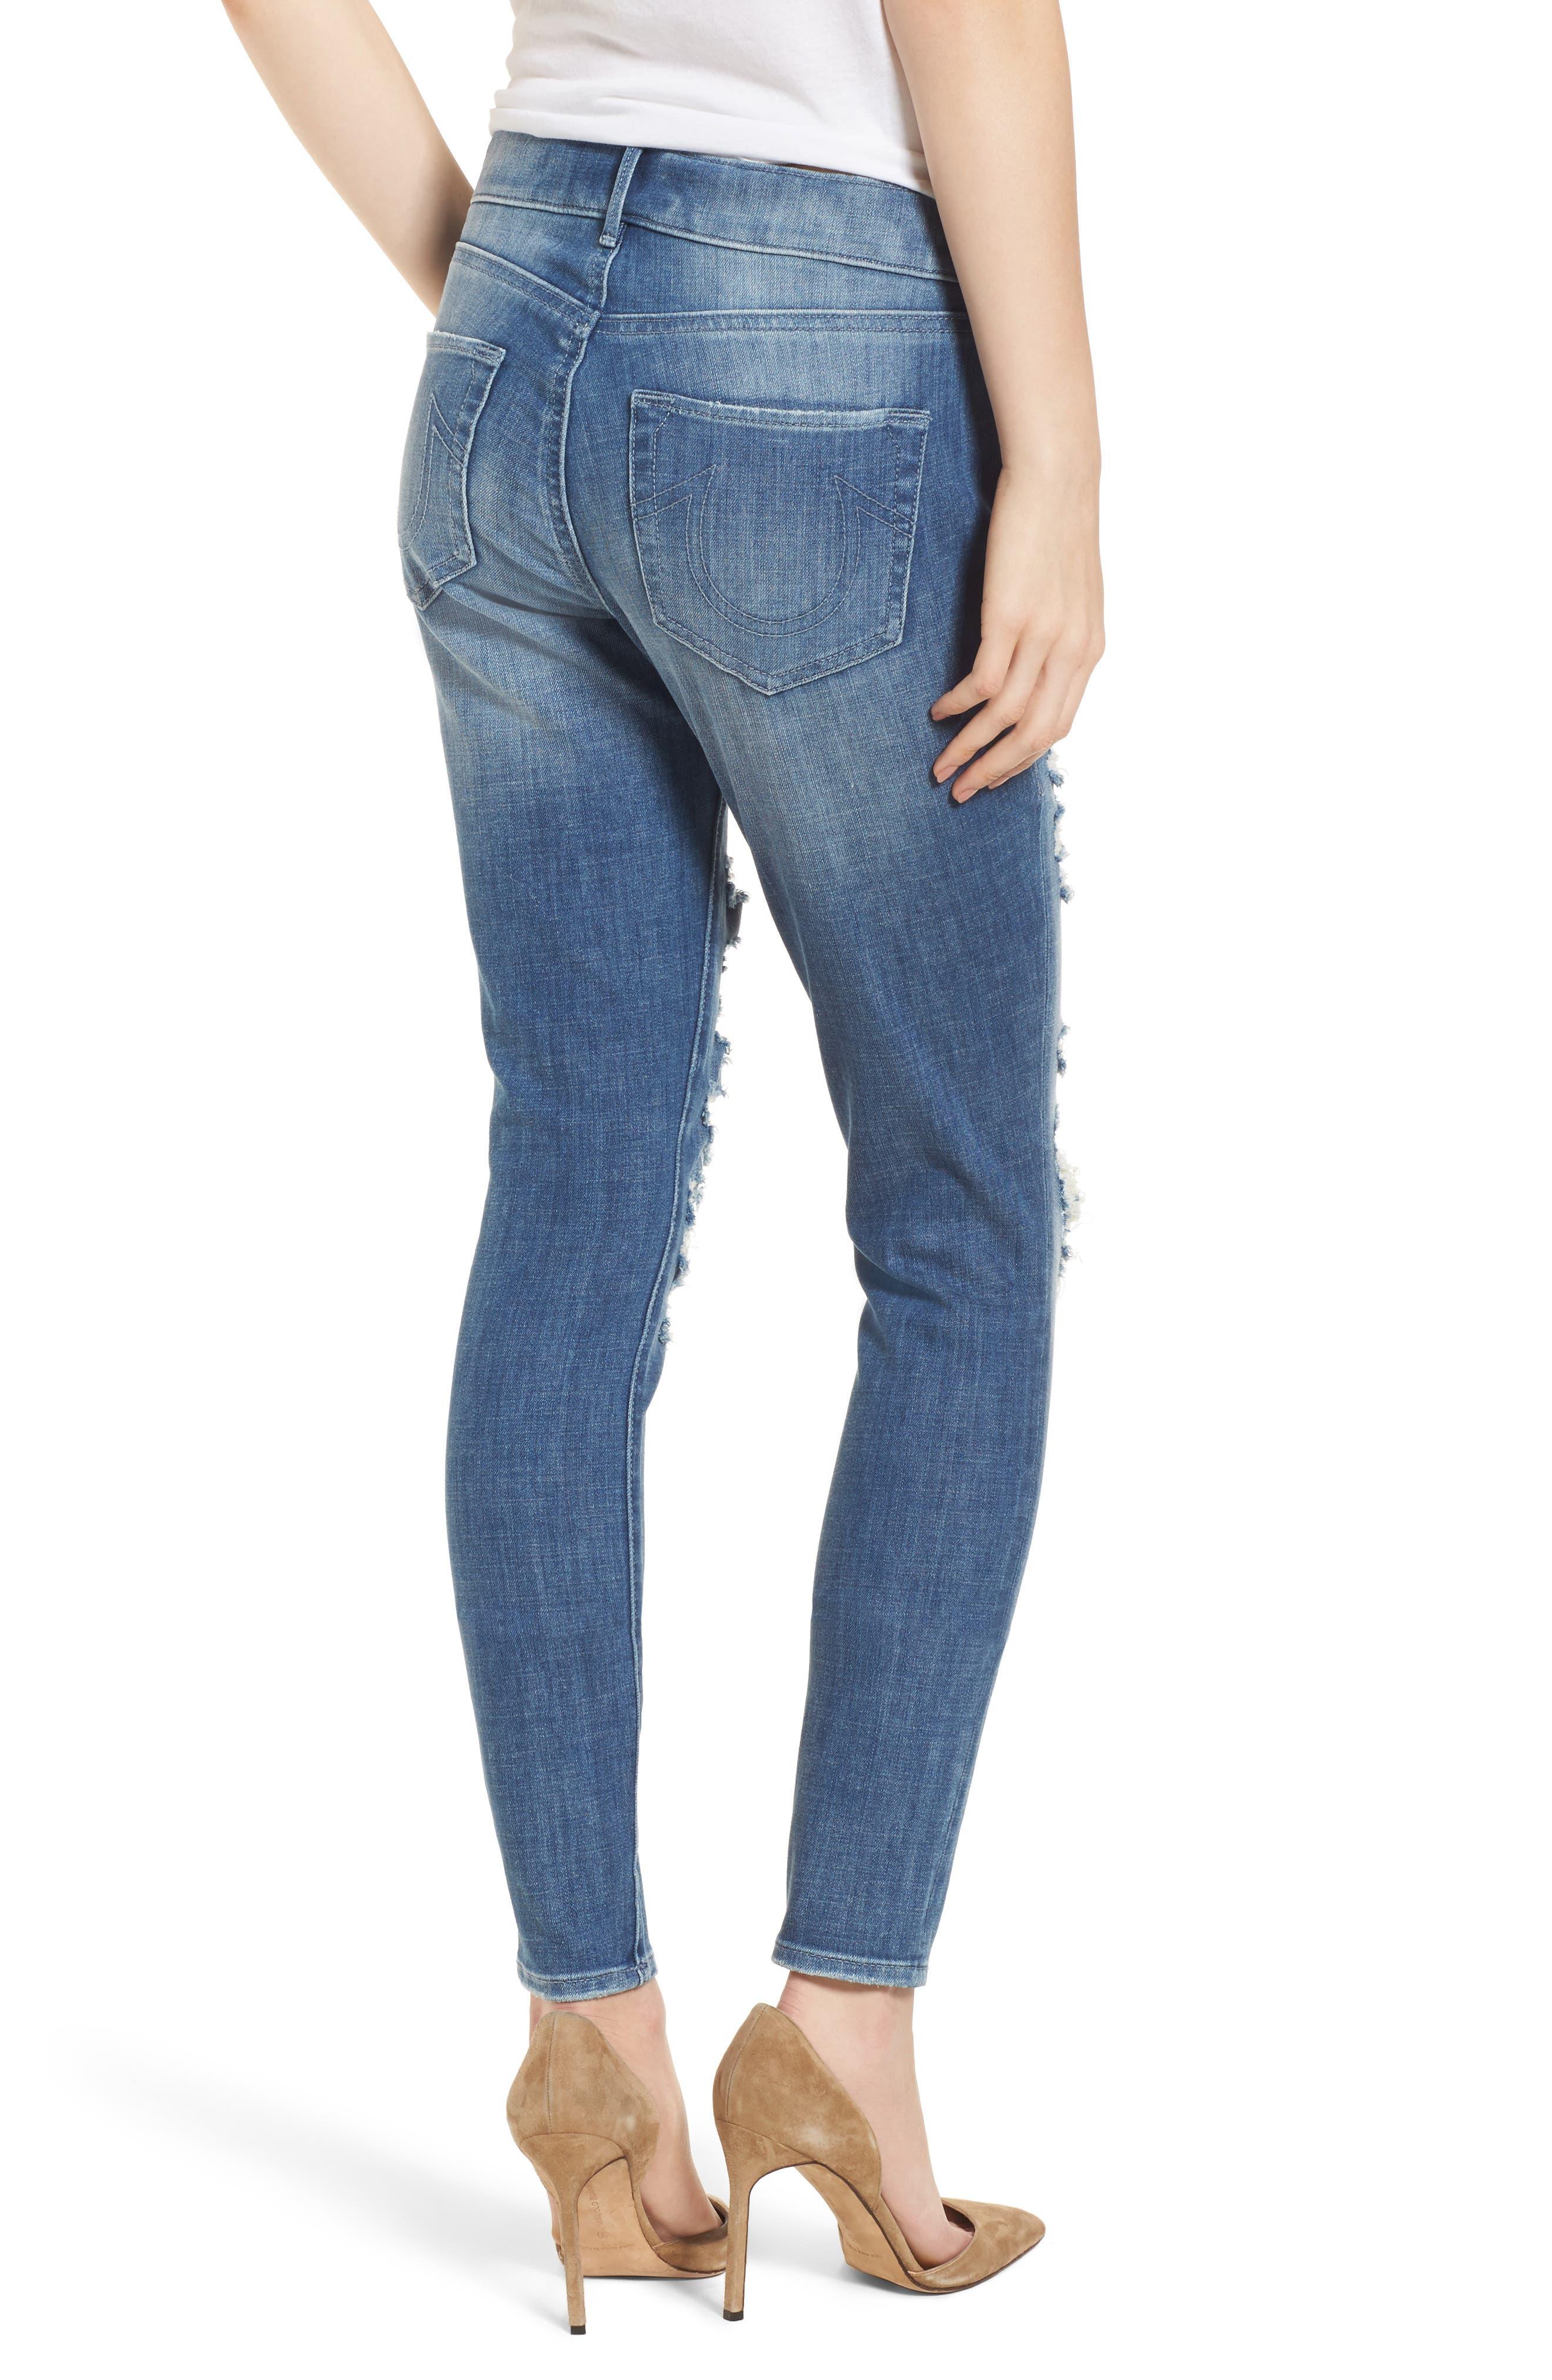 Jennie Runaway Legging Jeans,                             Alternate thumbnail 2, color,                             401